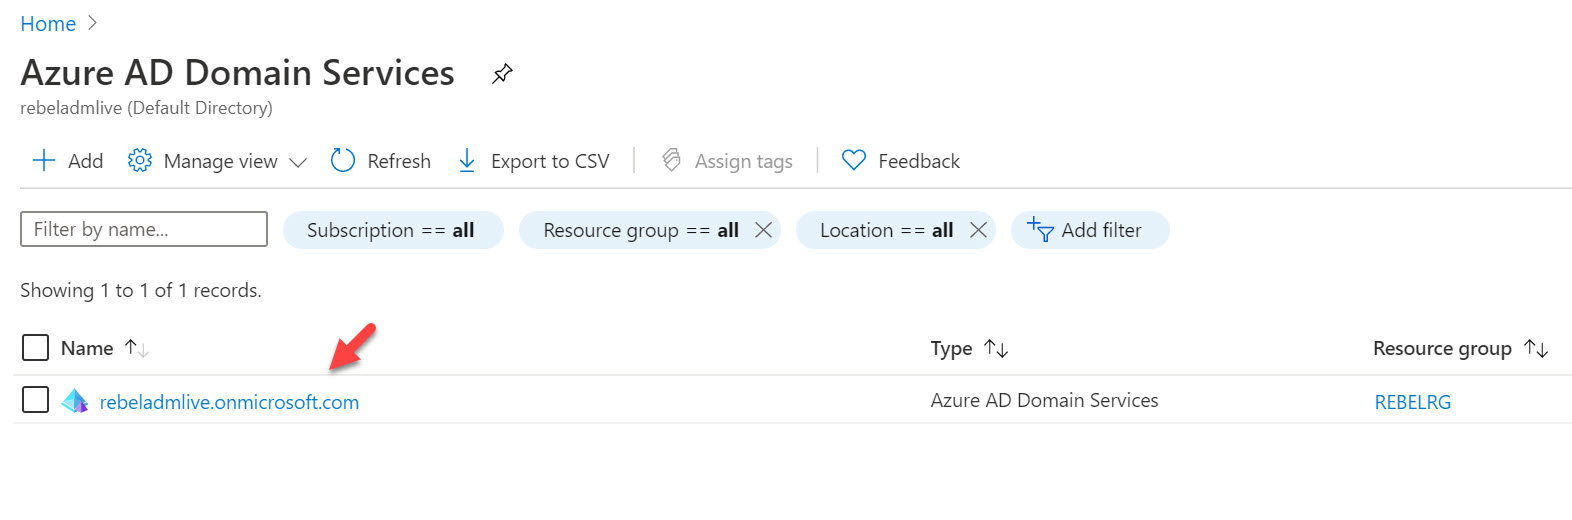 Azure Active Directory Domain Services instance